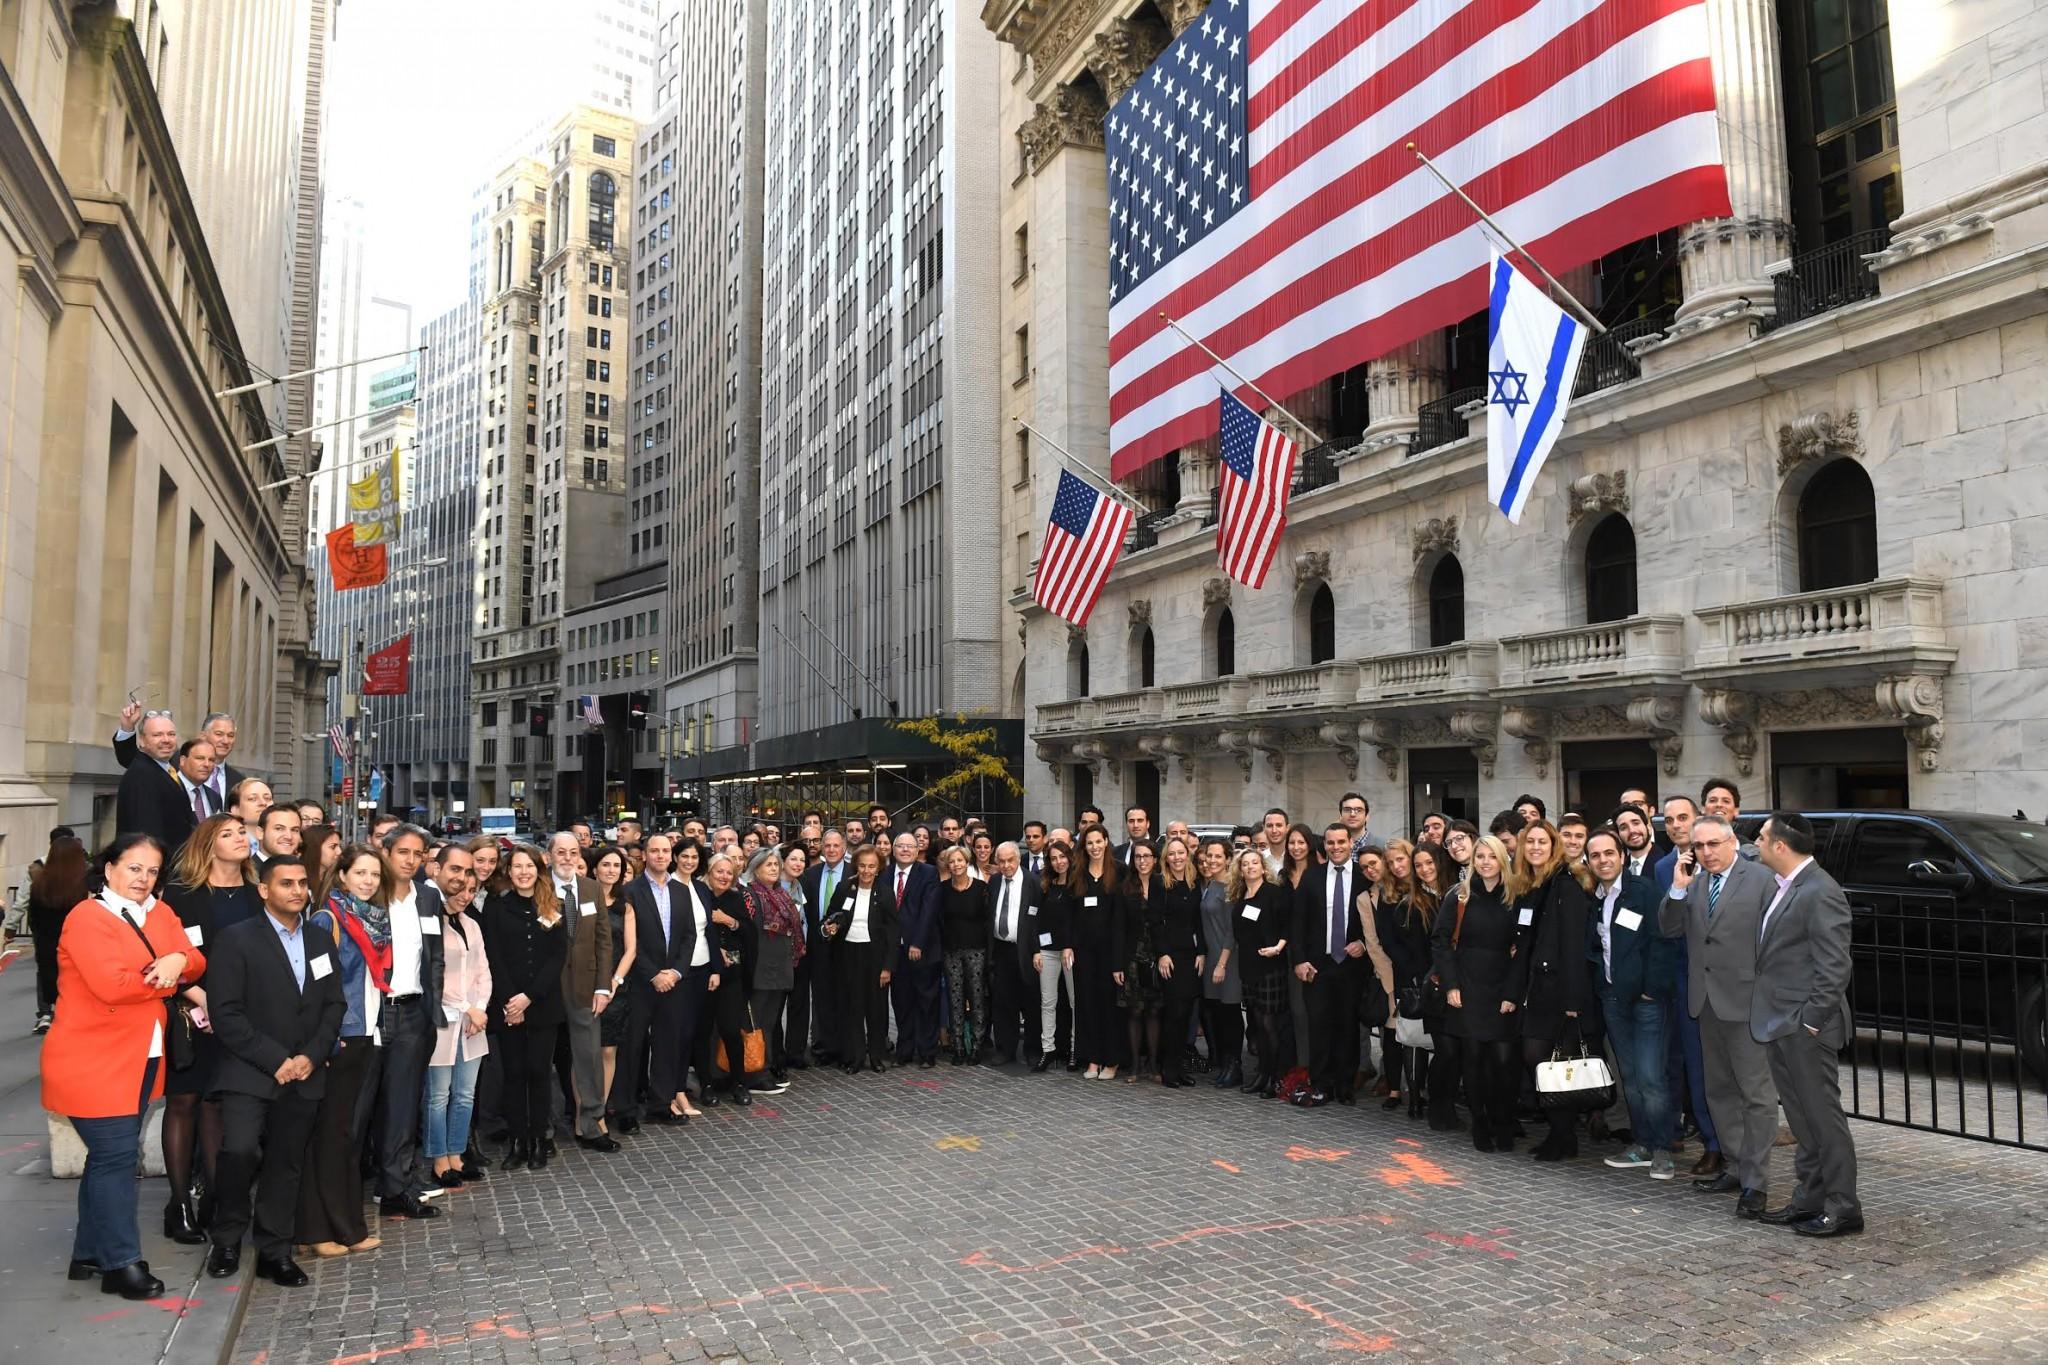 Israel Day at the NYSE. Photo by Shahar Azran